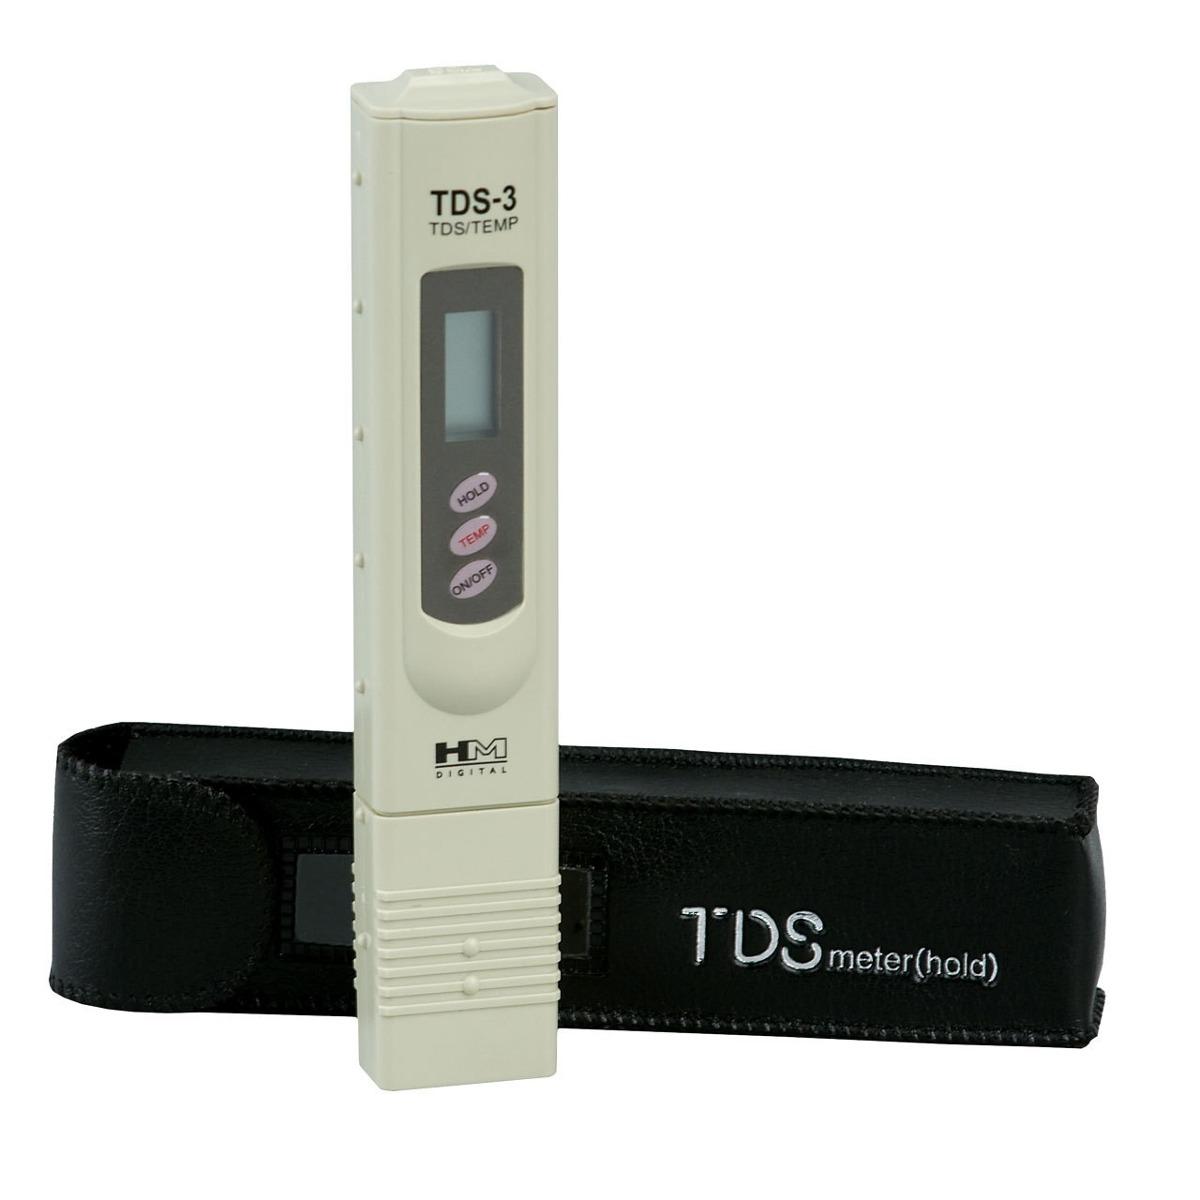 Medidor Condutivímetro Digital TDS Dureza Pureza da Água - RPC-COMMERCE